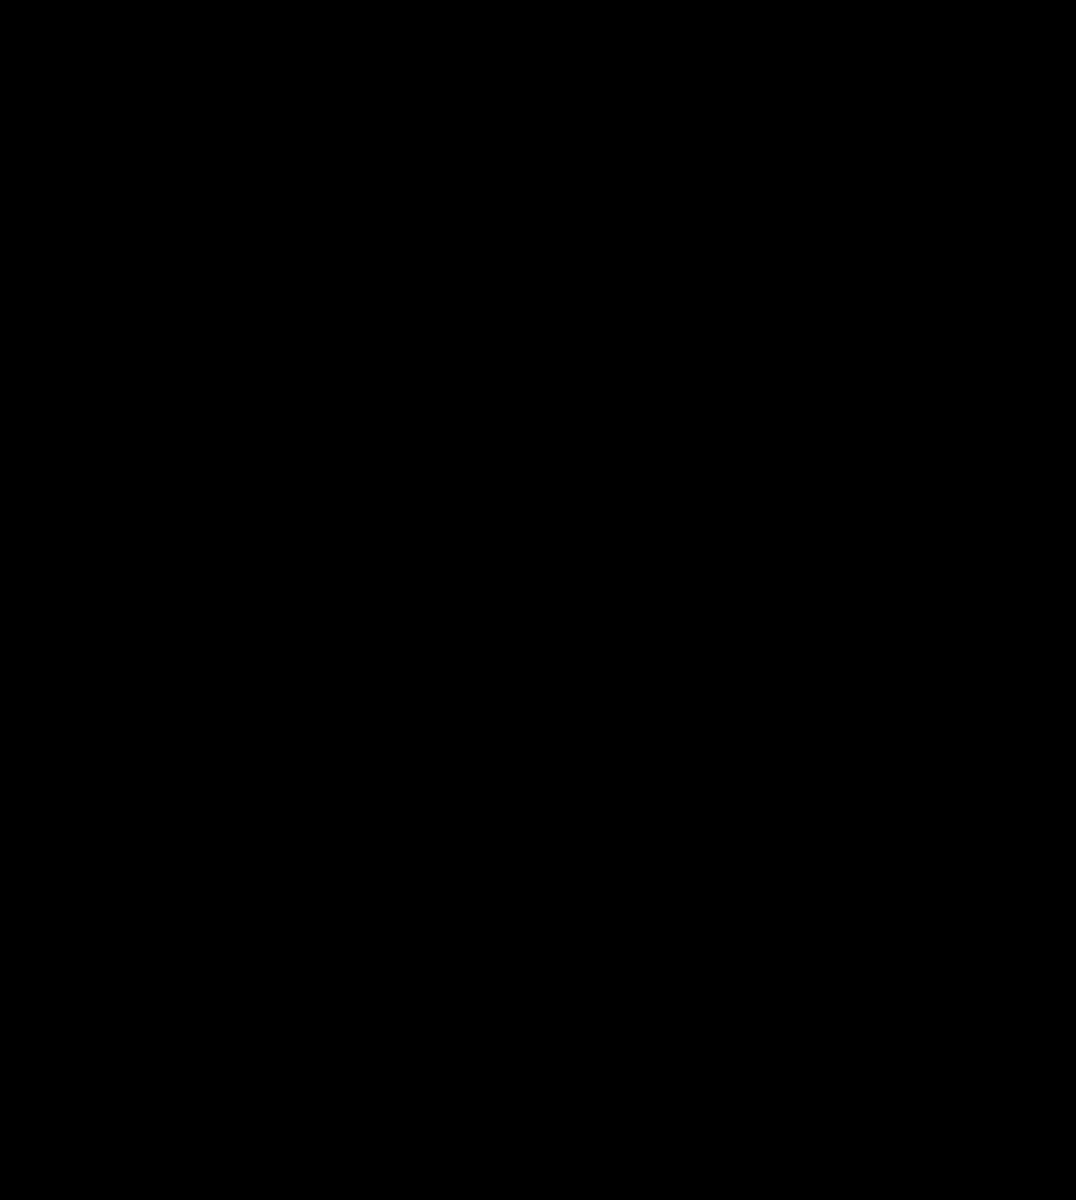 f:id:kumoi-kujira:20200812125259p:plain